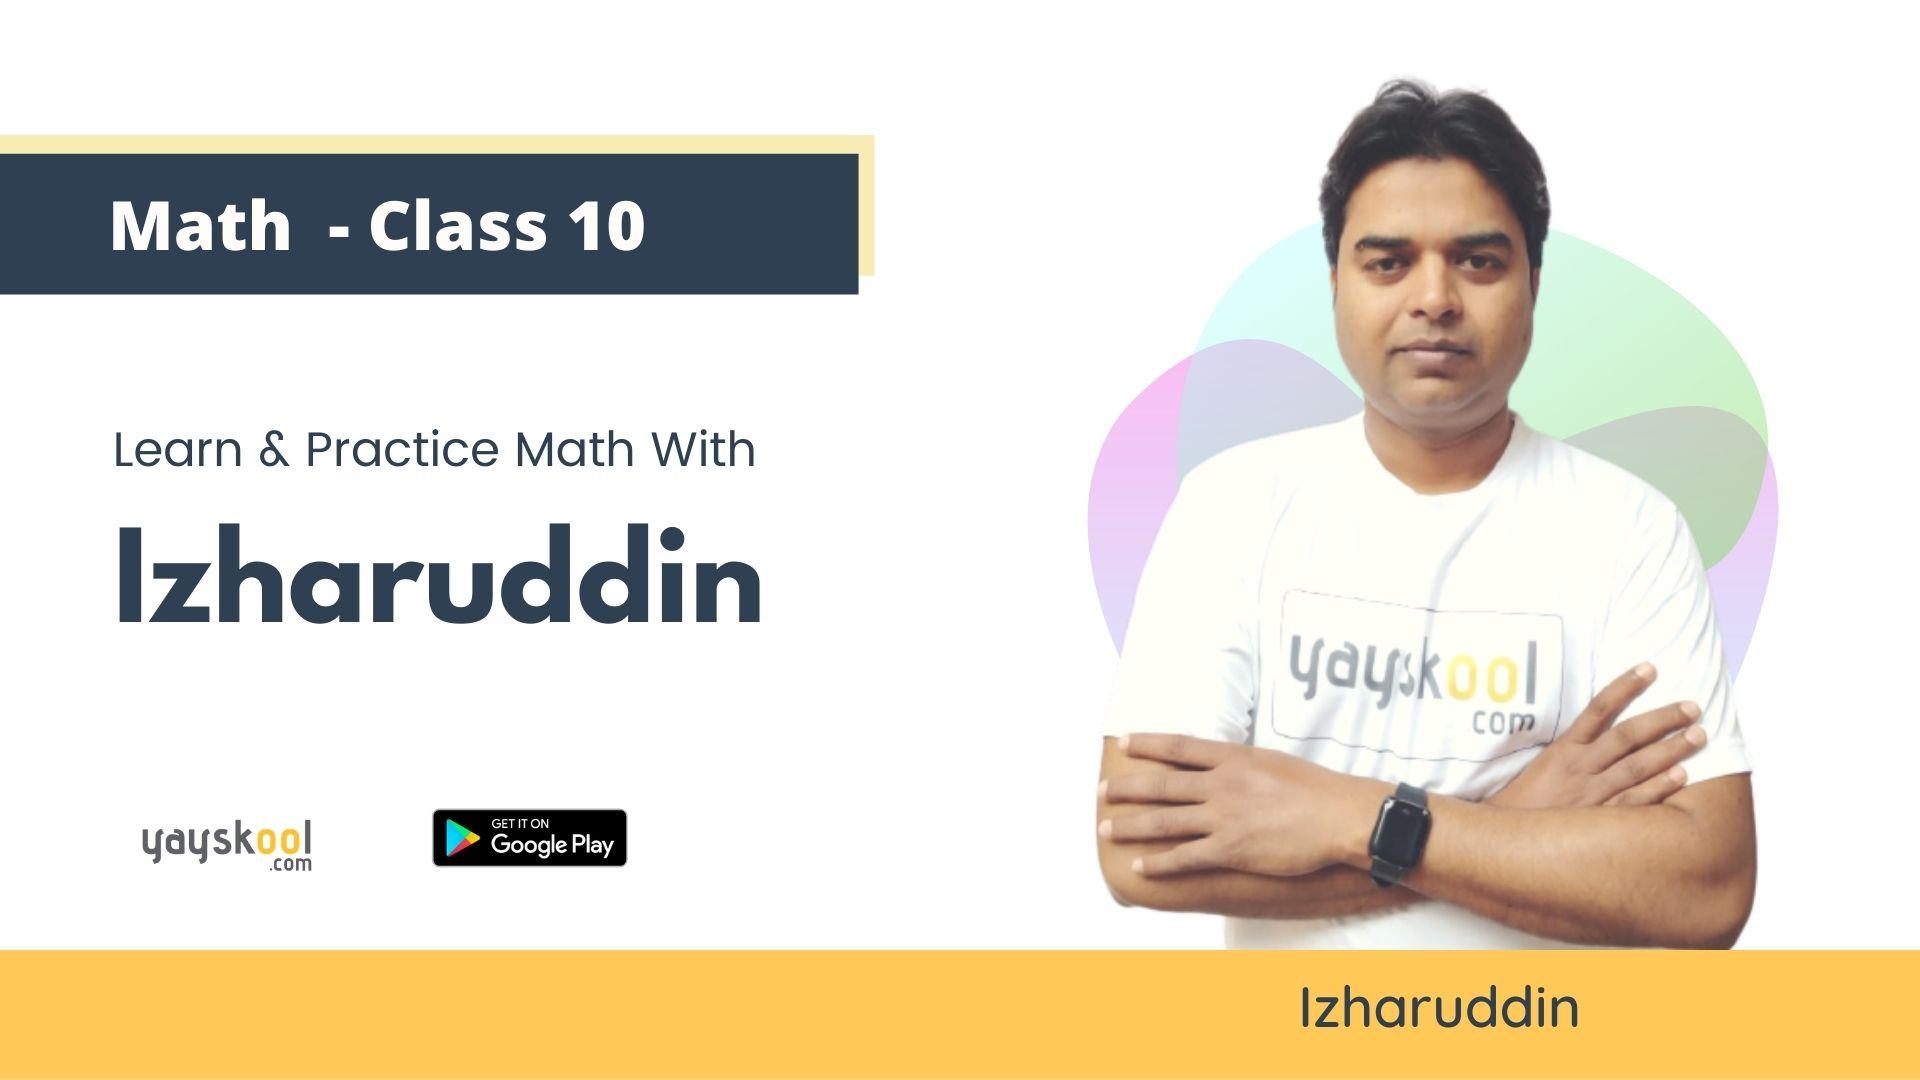 Study & Practice Maths With Izharuddin - Class 10 (CBSE/NCERT)